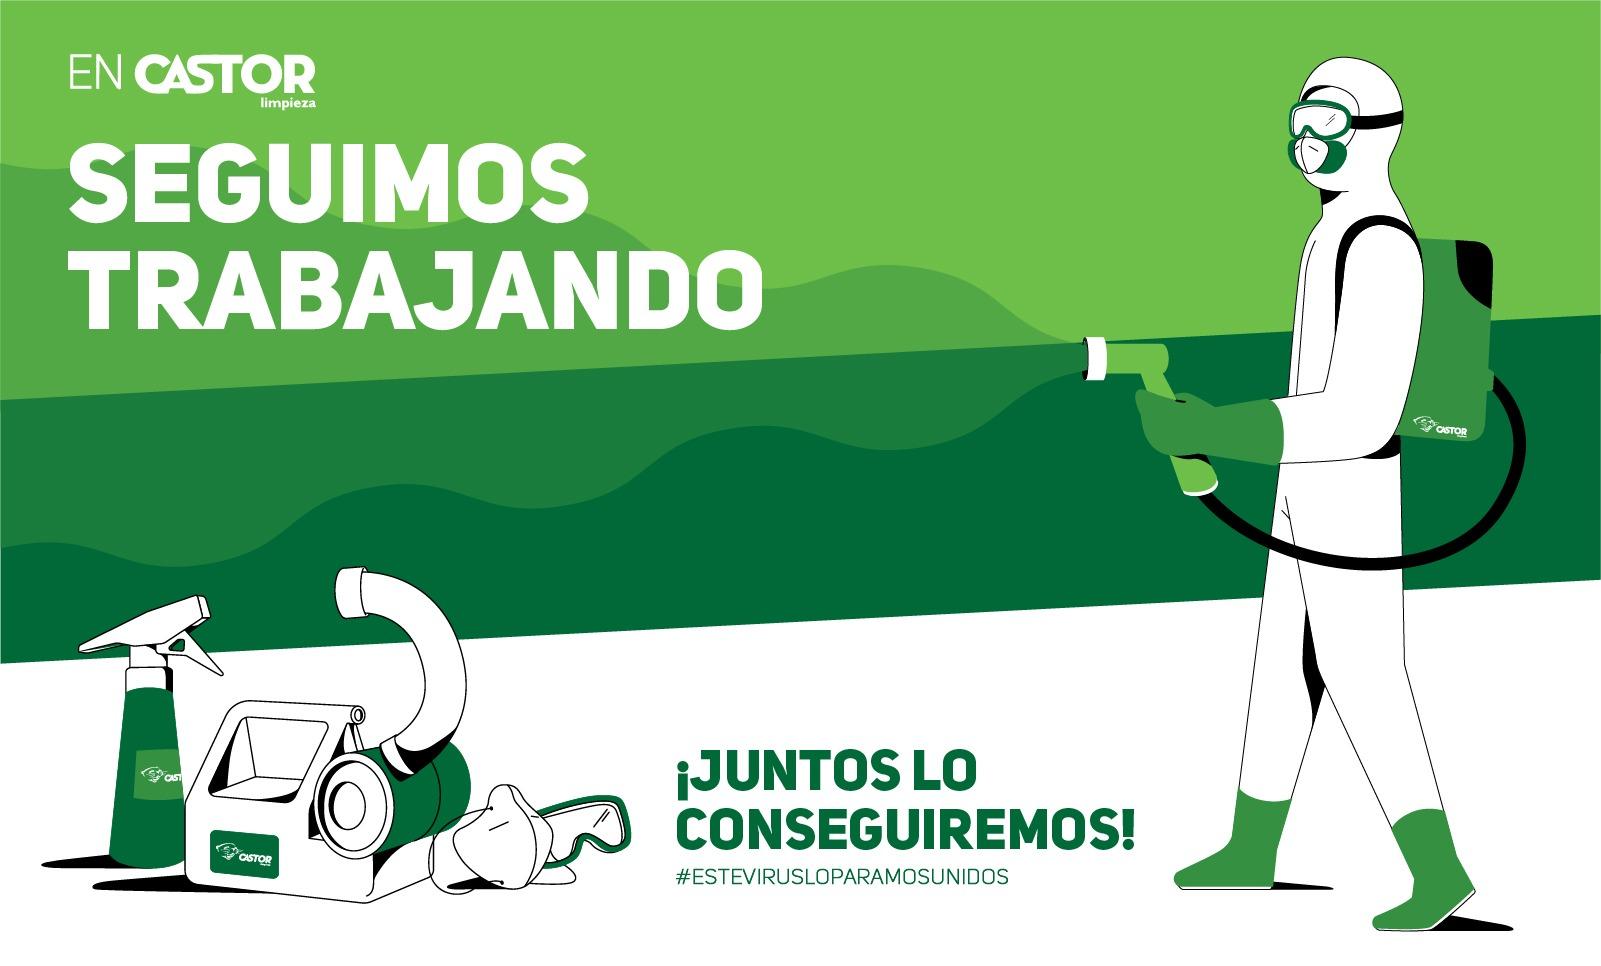 Limpiezas Castor. Mailing-RRSS-06 Noticias